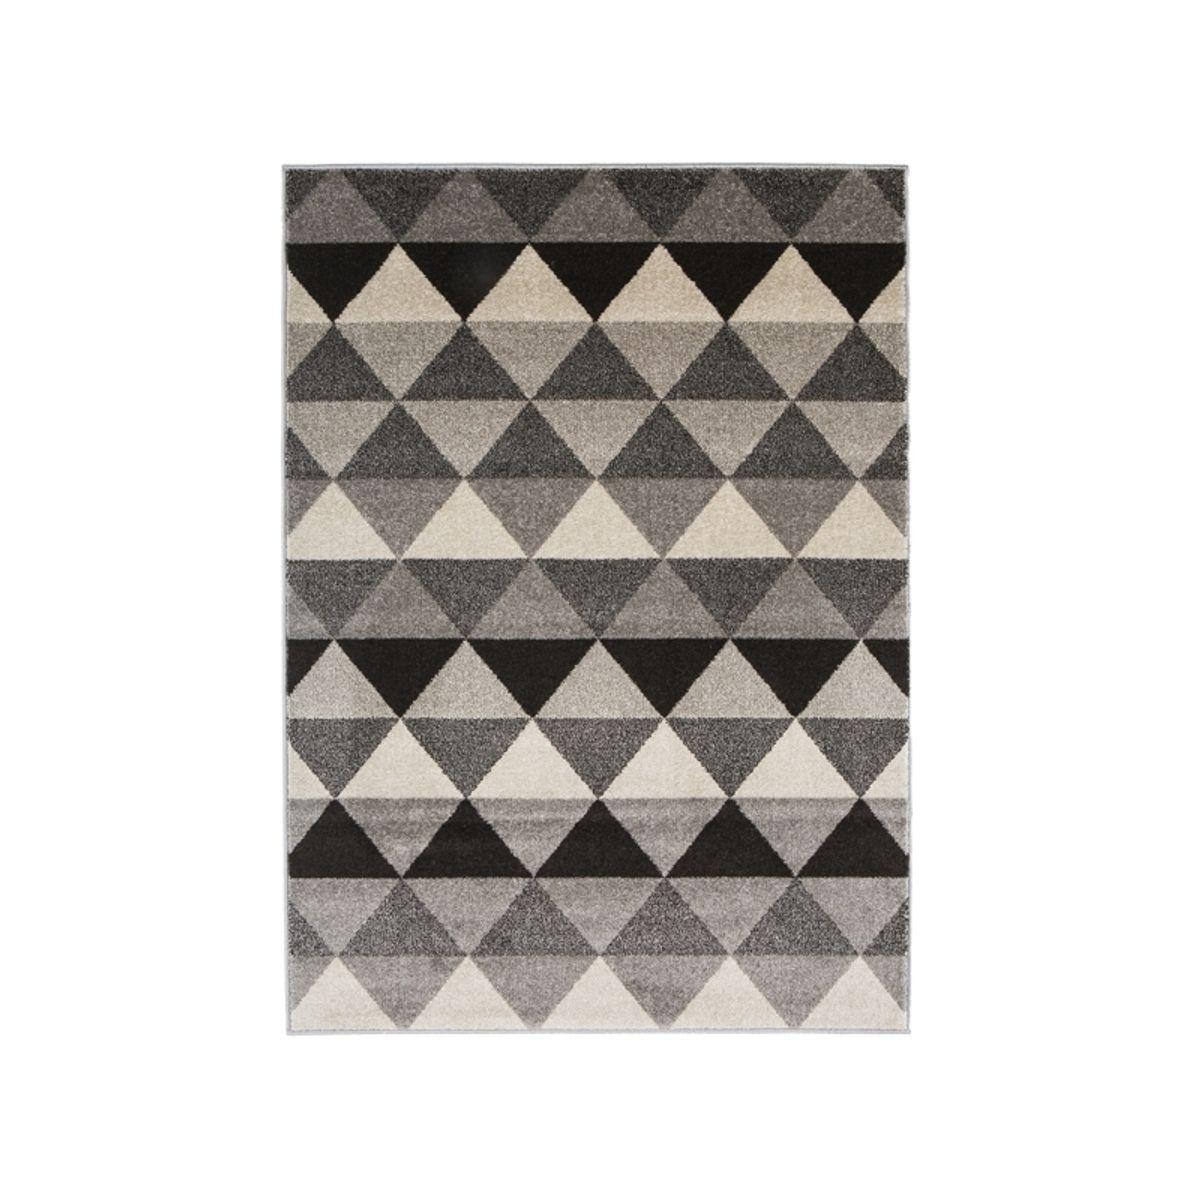 Tapis Maoke losange gris 060x110cm